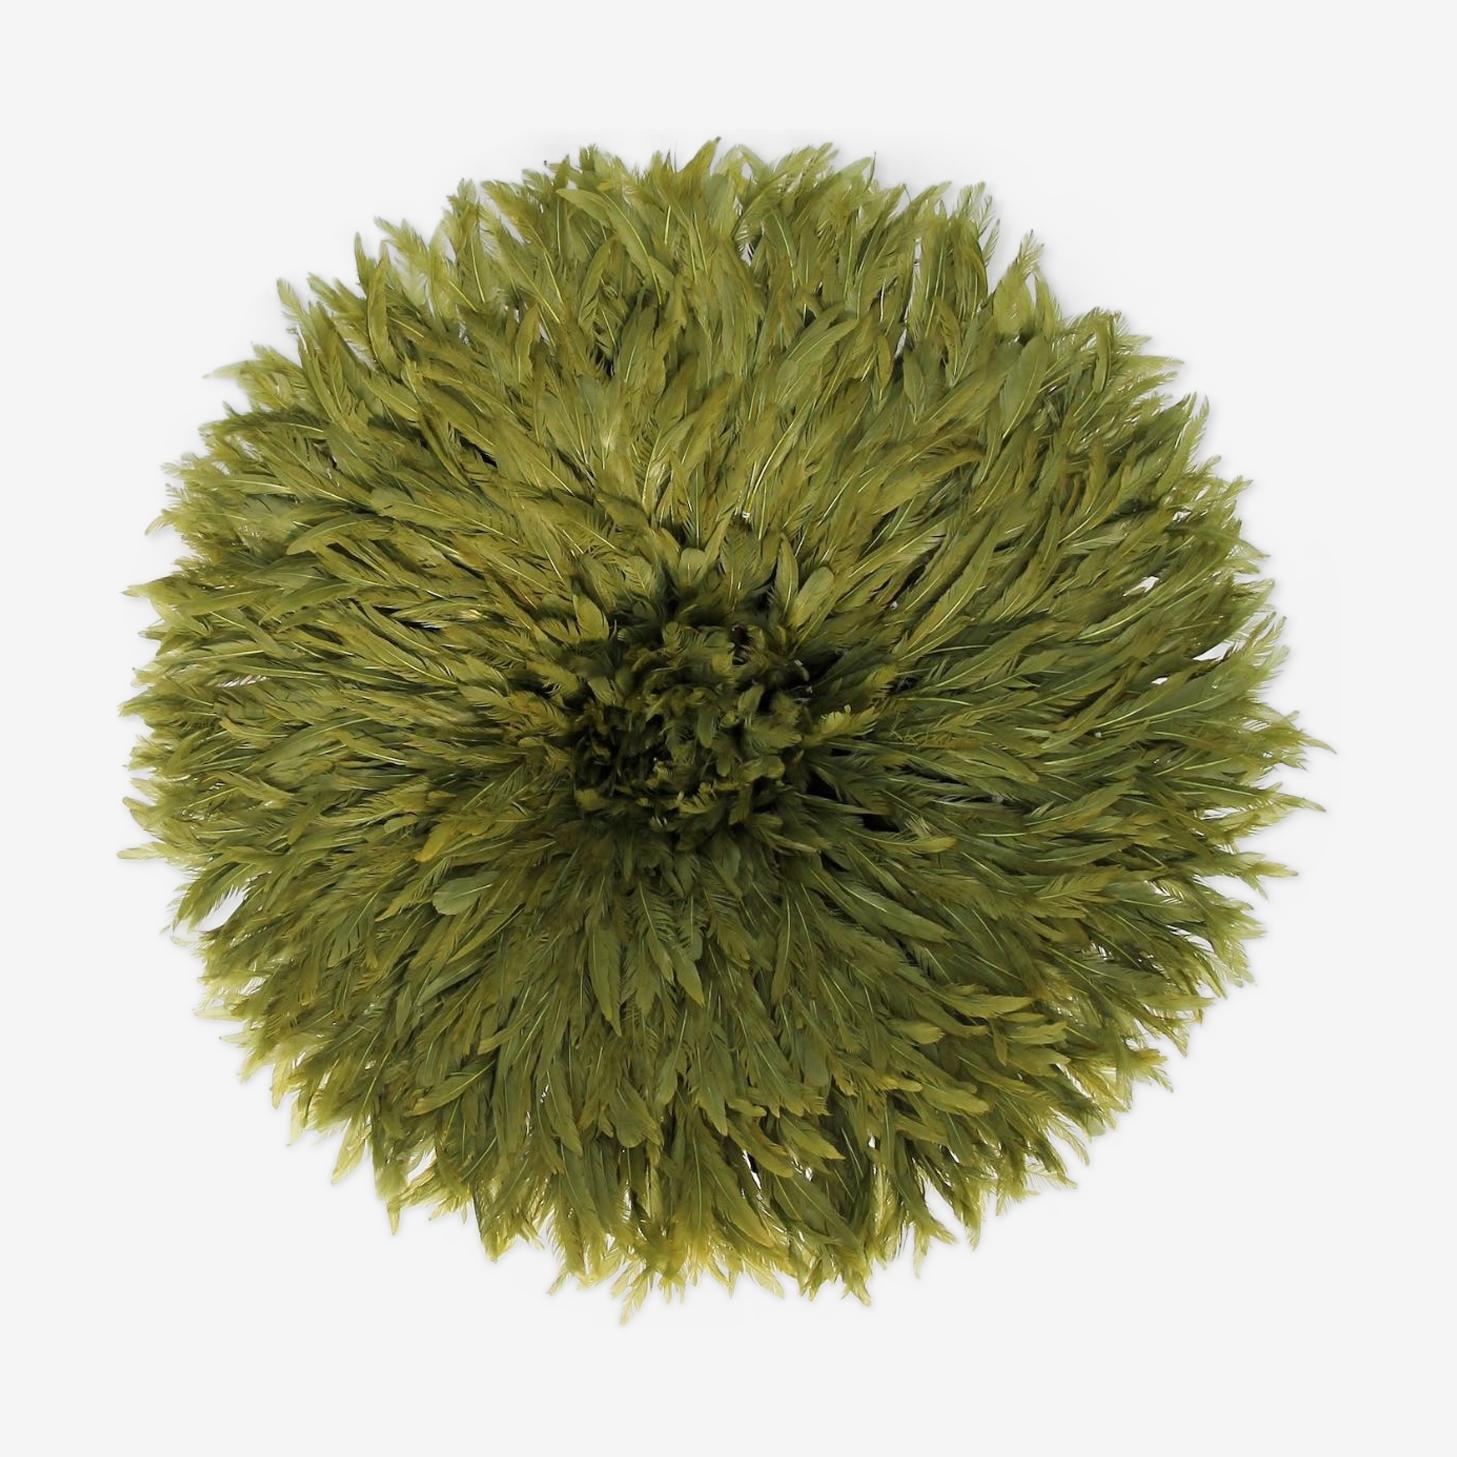 Juju Hat military green of 70 cm